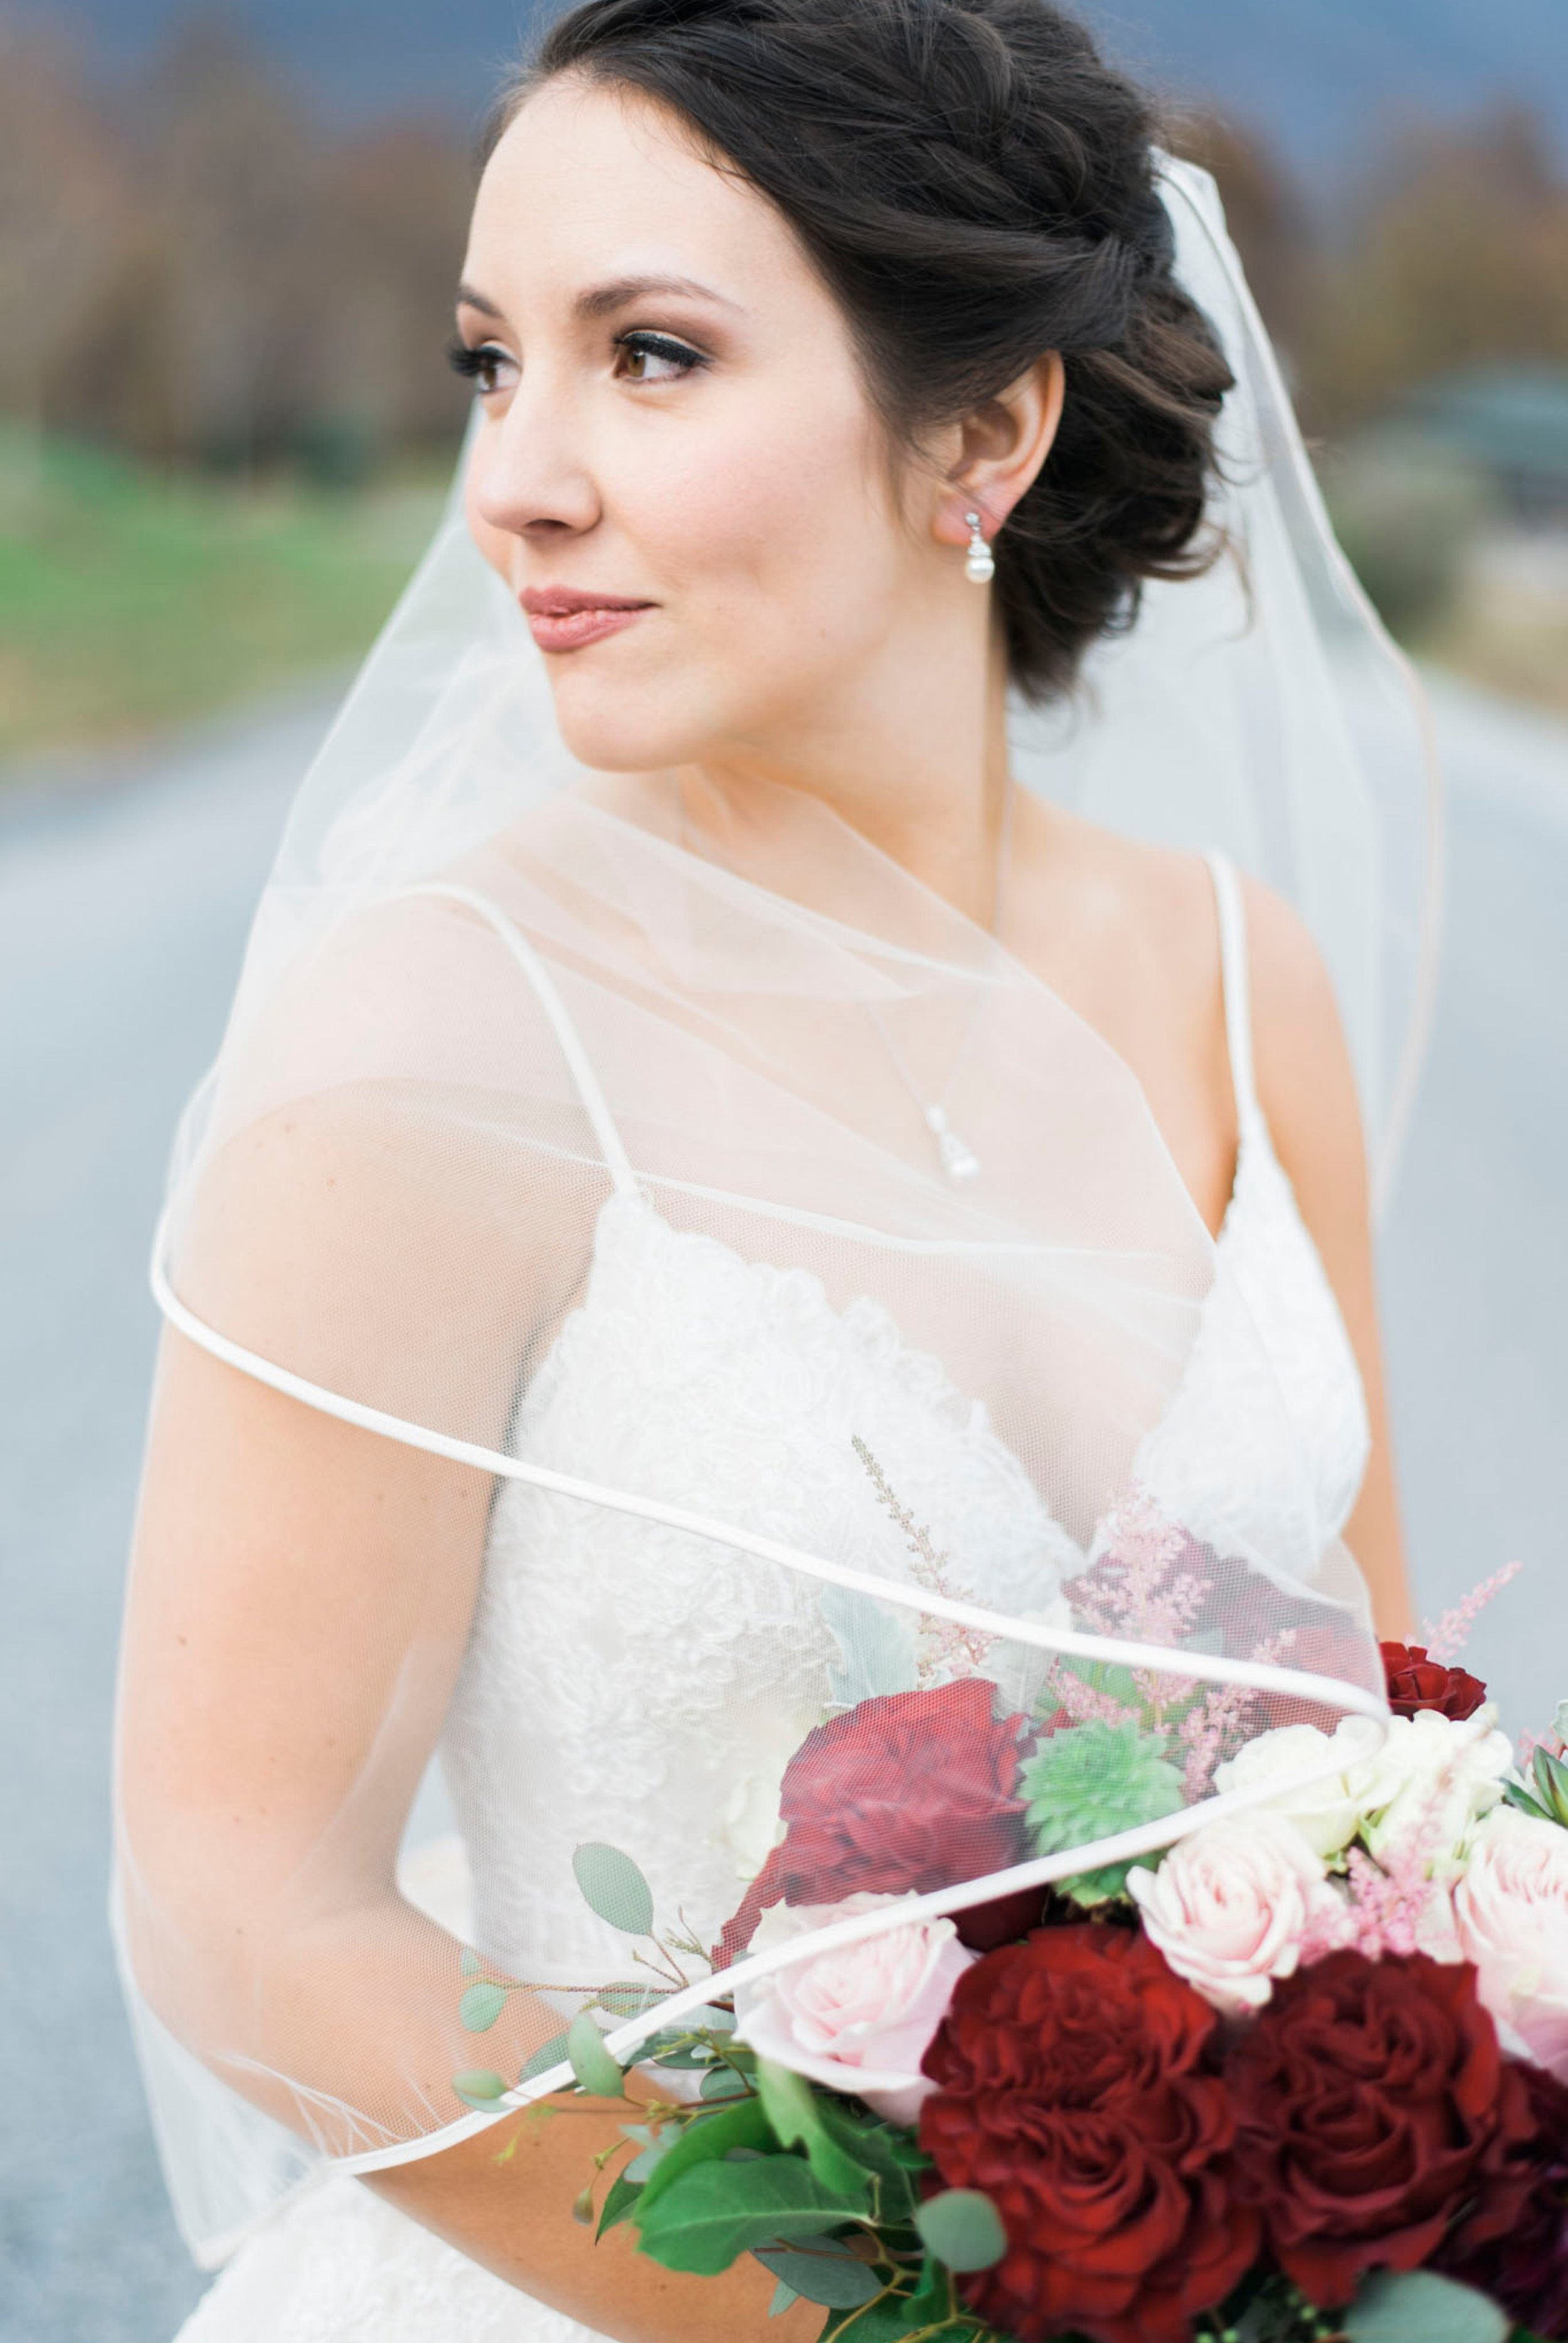 IrvineEstate_LexingtonVA_Wedding_FallWedding_VirginiaWeddingPhotographer 47.jpg